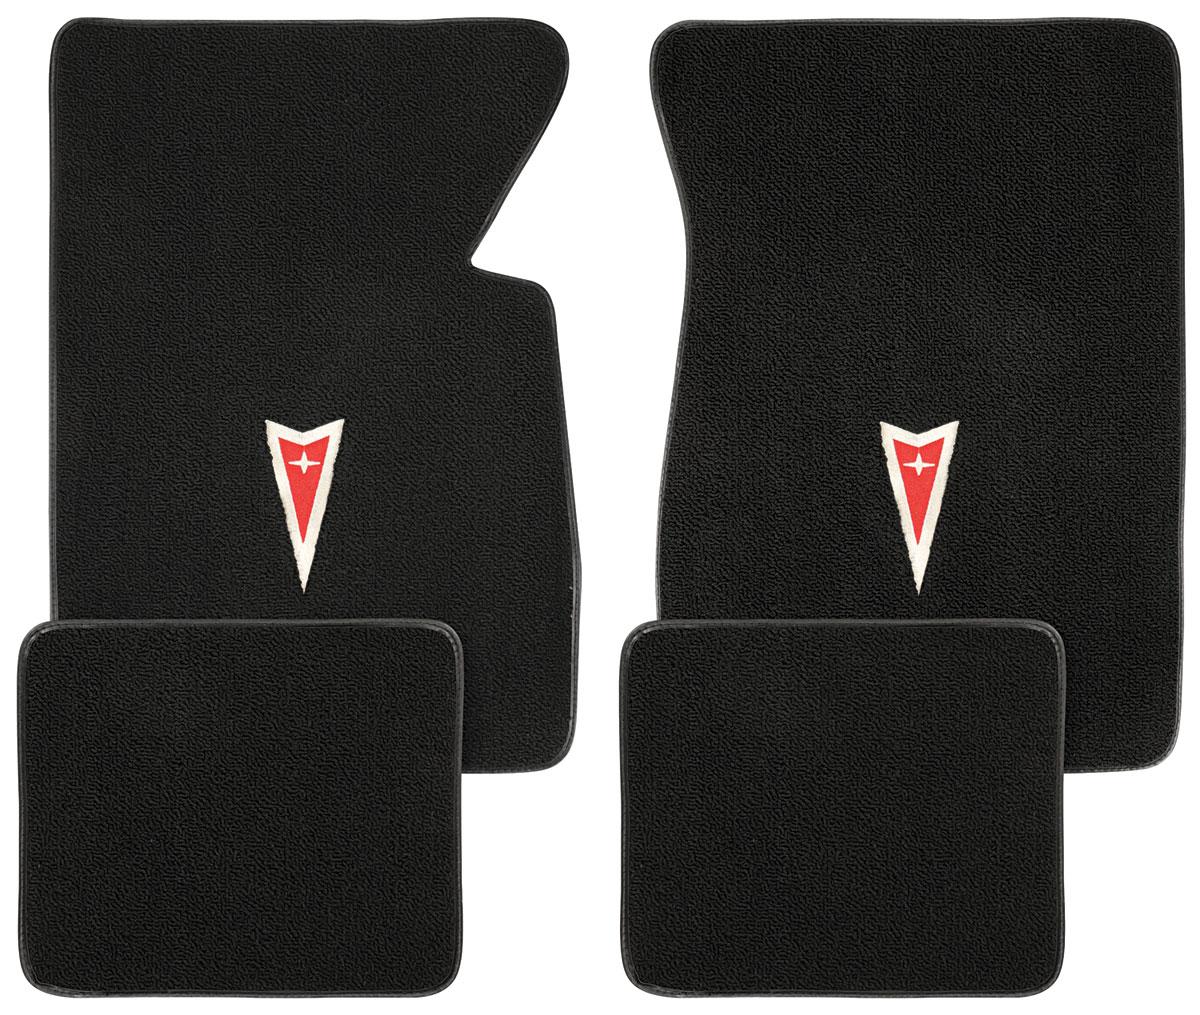 Floor Mats, Raylon 1959-76 Bonneville/Catalina/1962-68 Grand Prix Arrowhead Logo